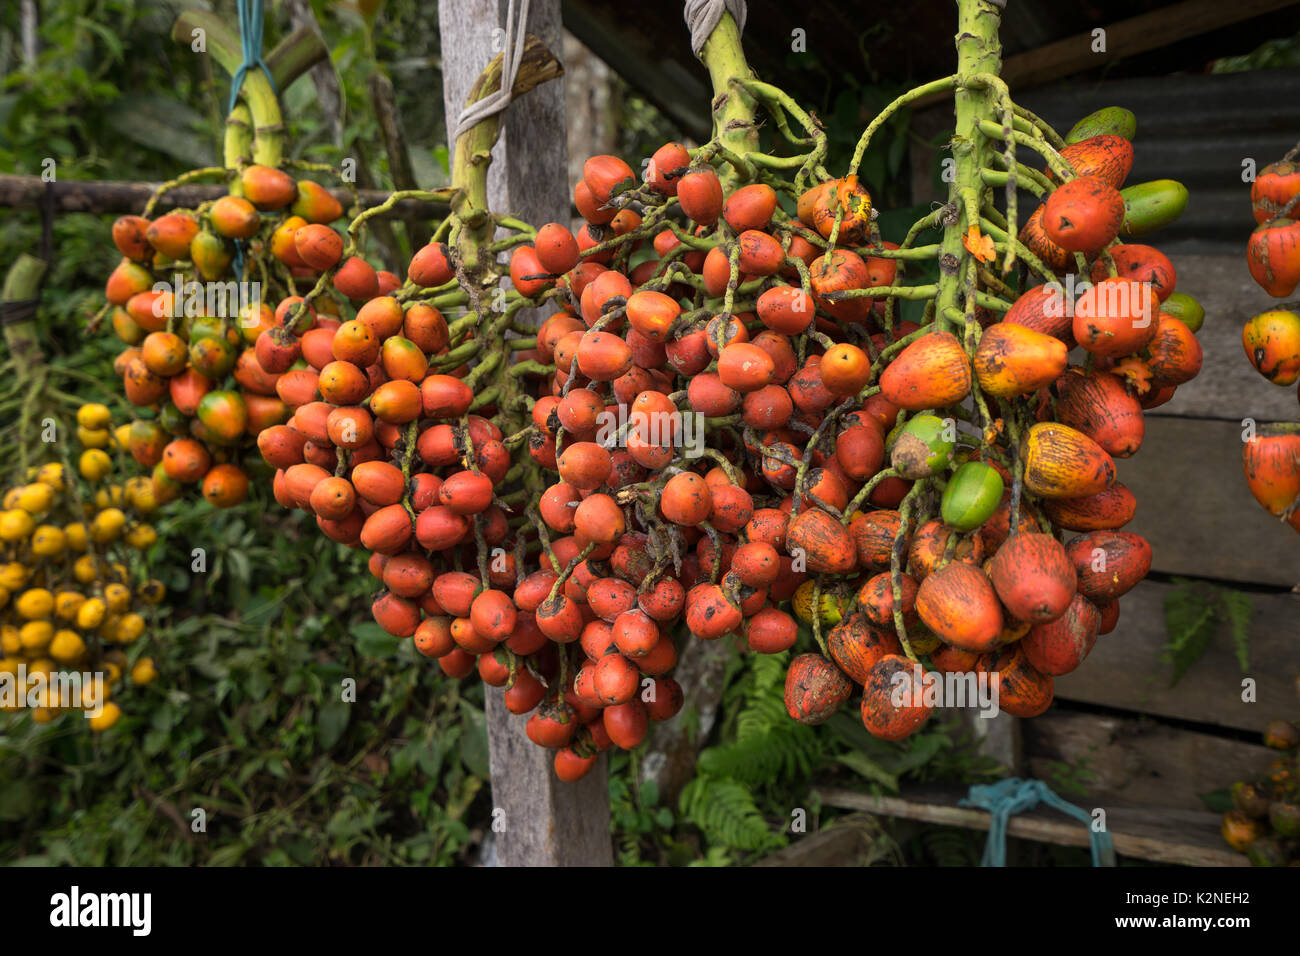 peach palm fruit clusters in Ecuadors Amazon region - Stock Image